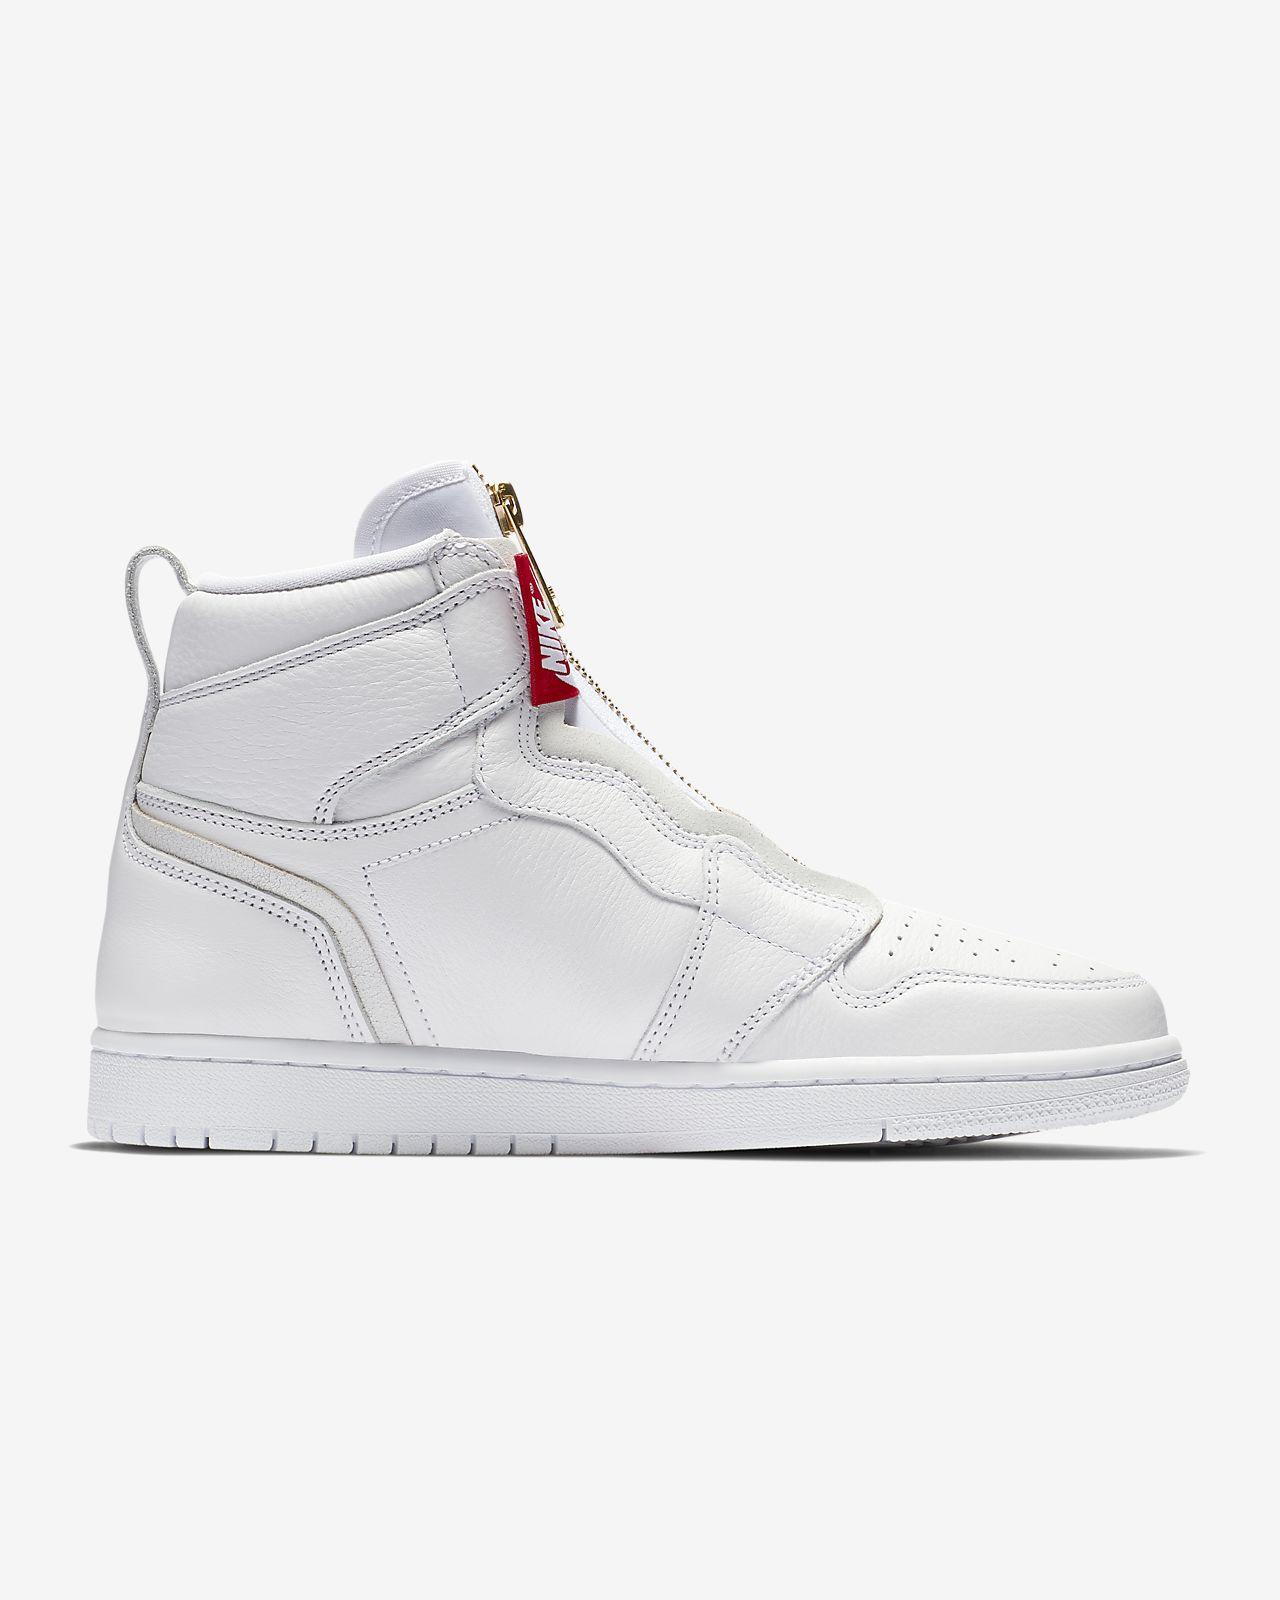 ... Chaussure Air Jordan 1 High Zip pour Femme